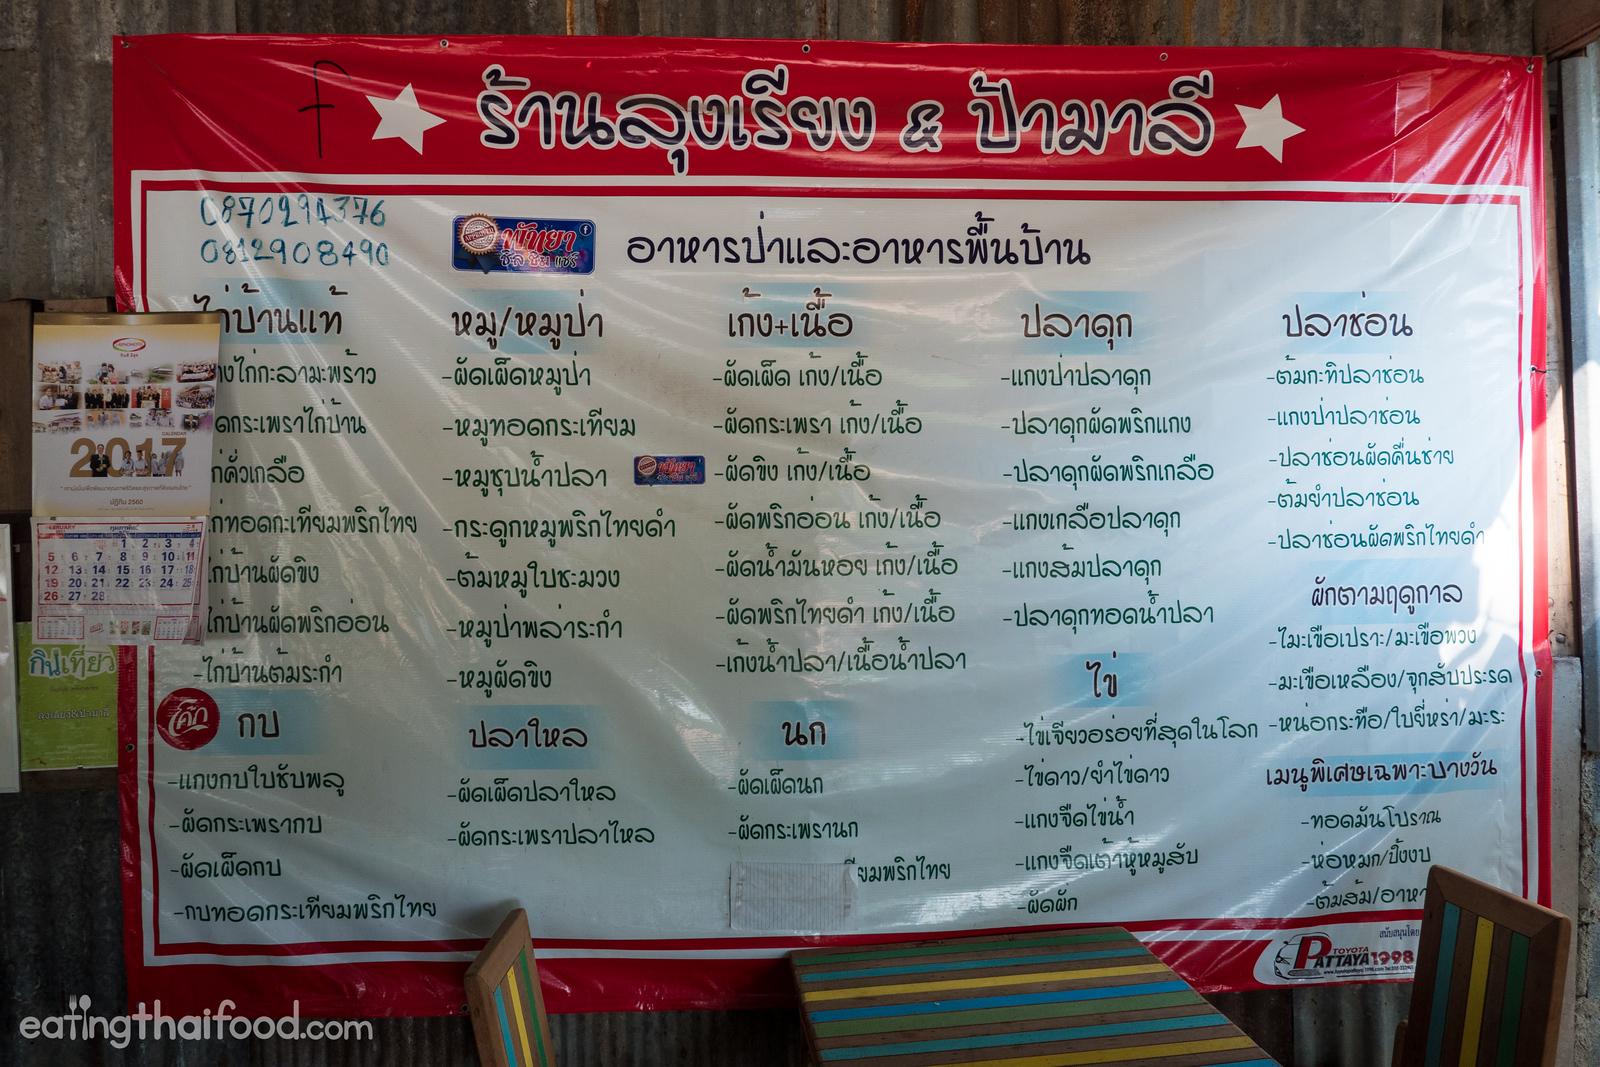 Loong Riang & Pamalee (ร้านลุงเรียง & ป้ามาลี)